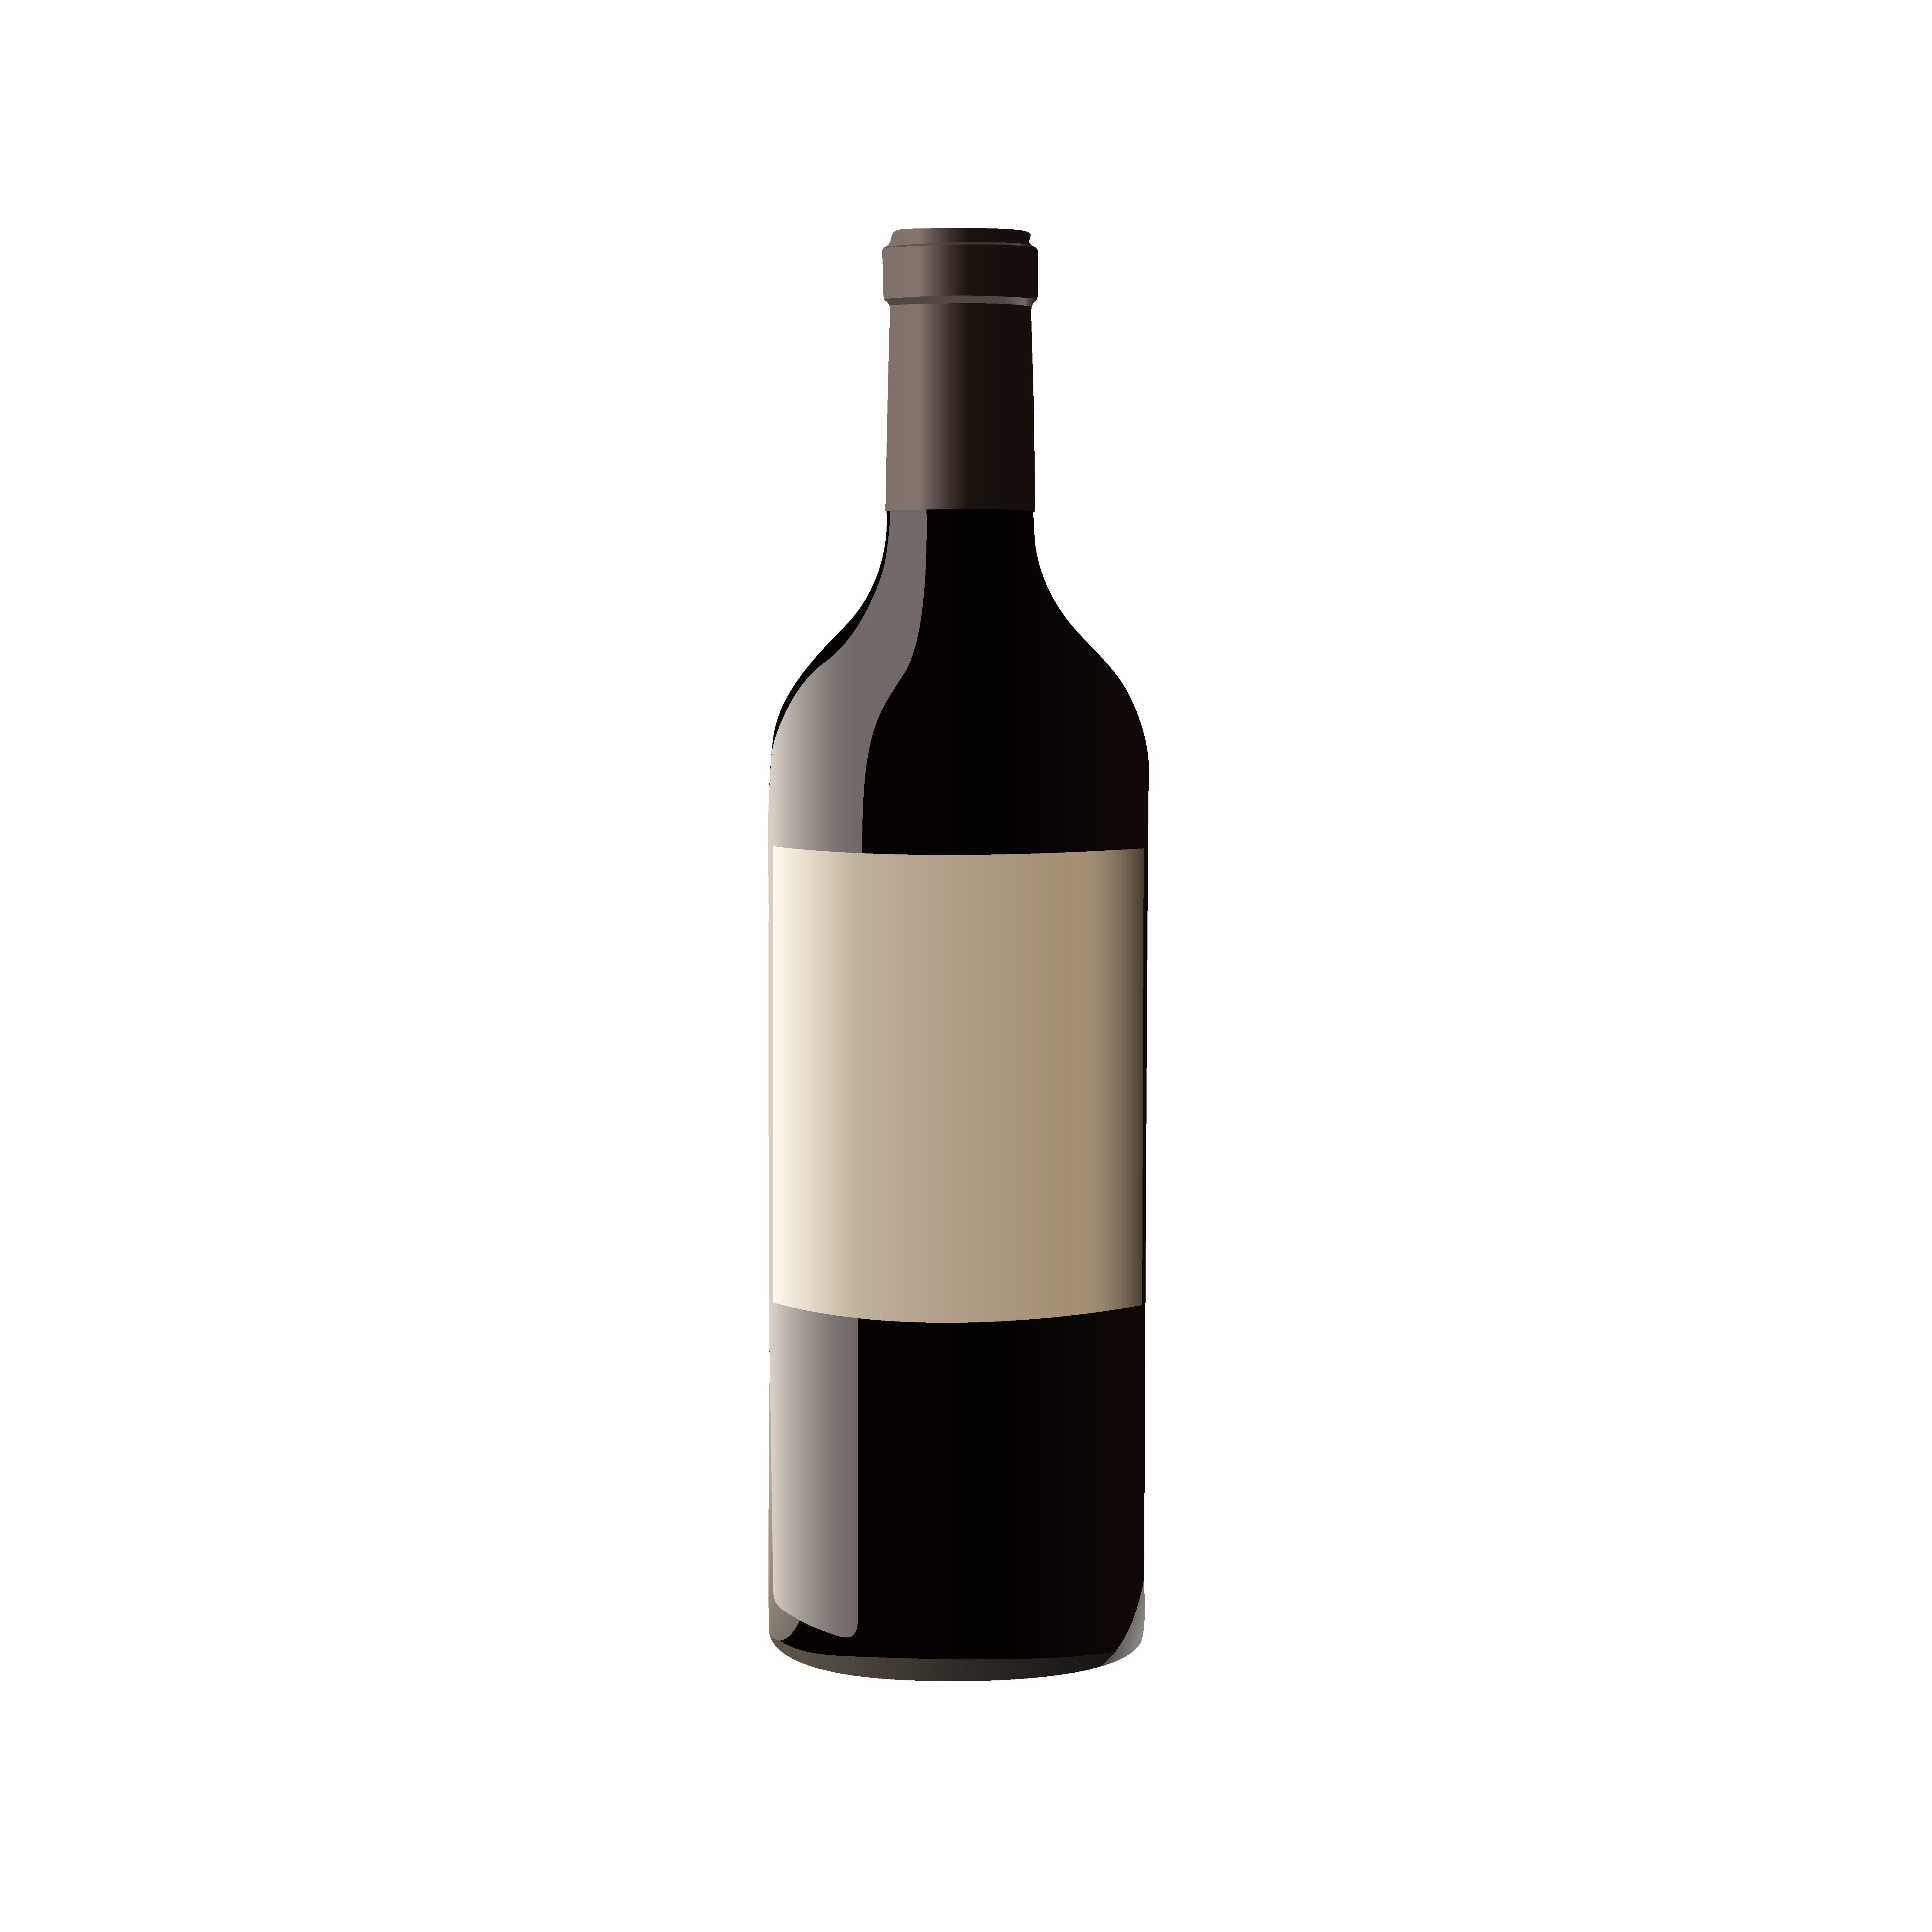 Wine bottle ~ Illustrations ~ Creative Market